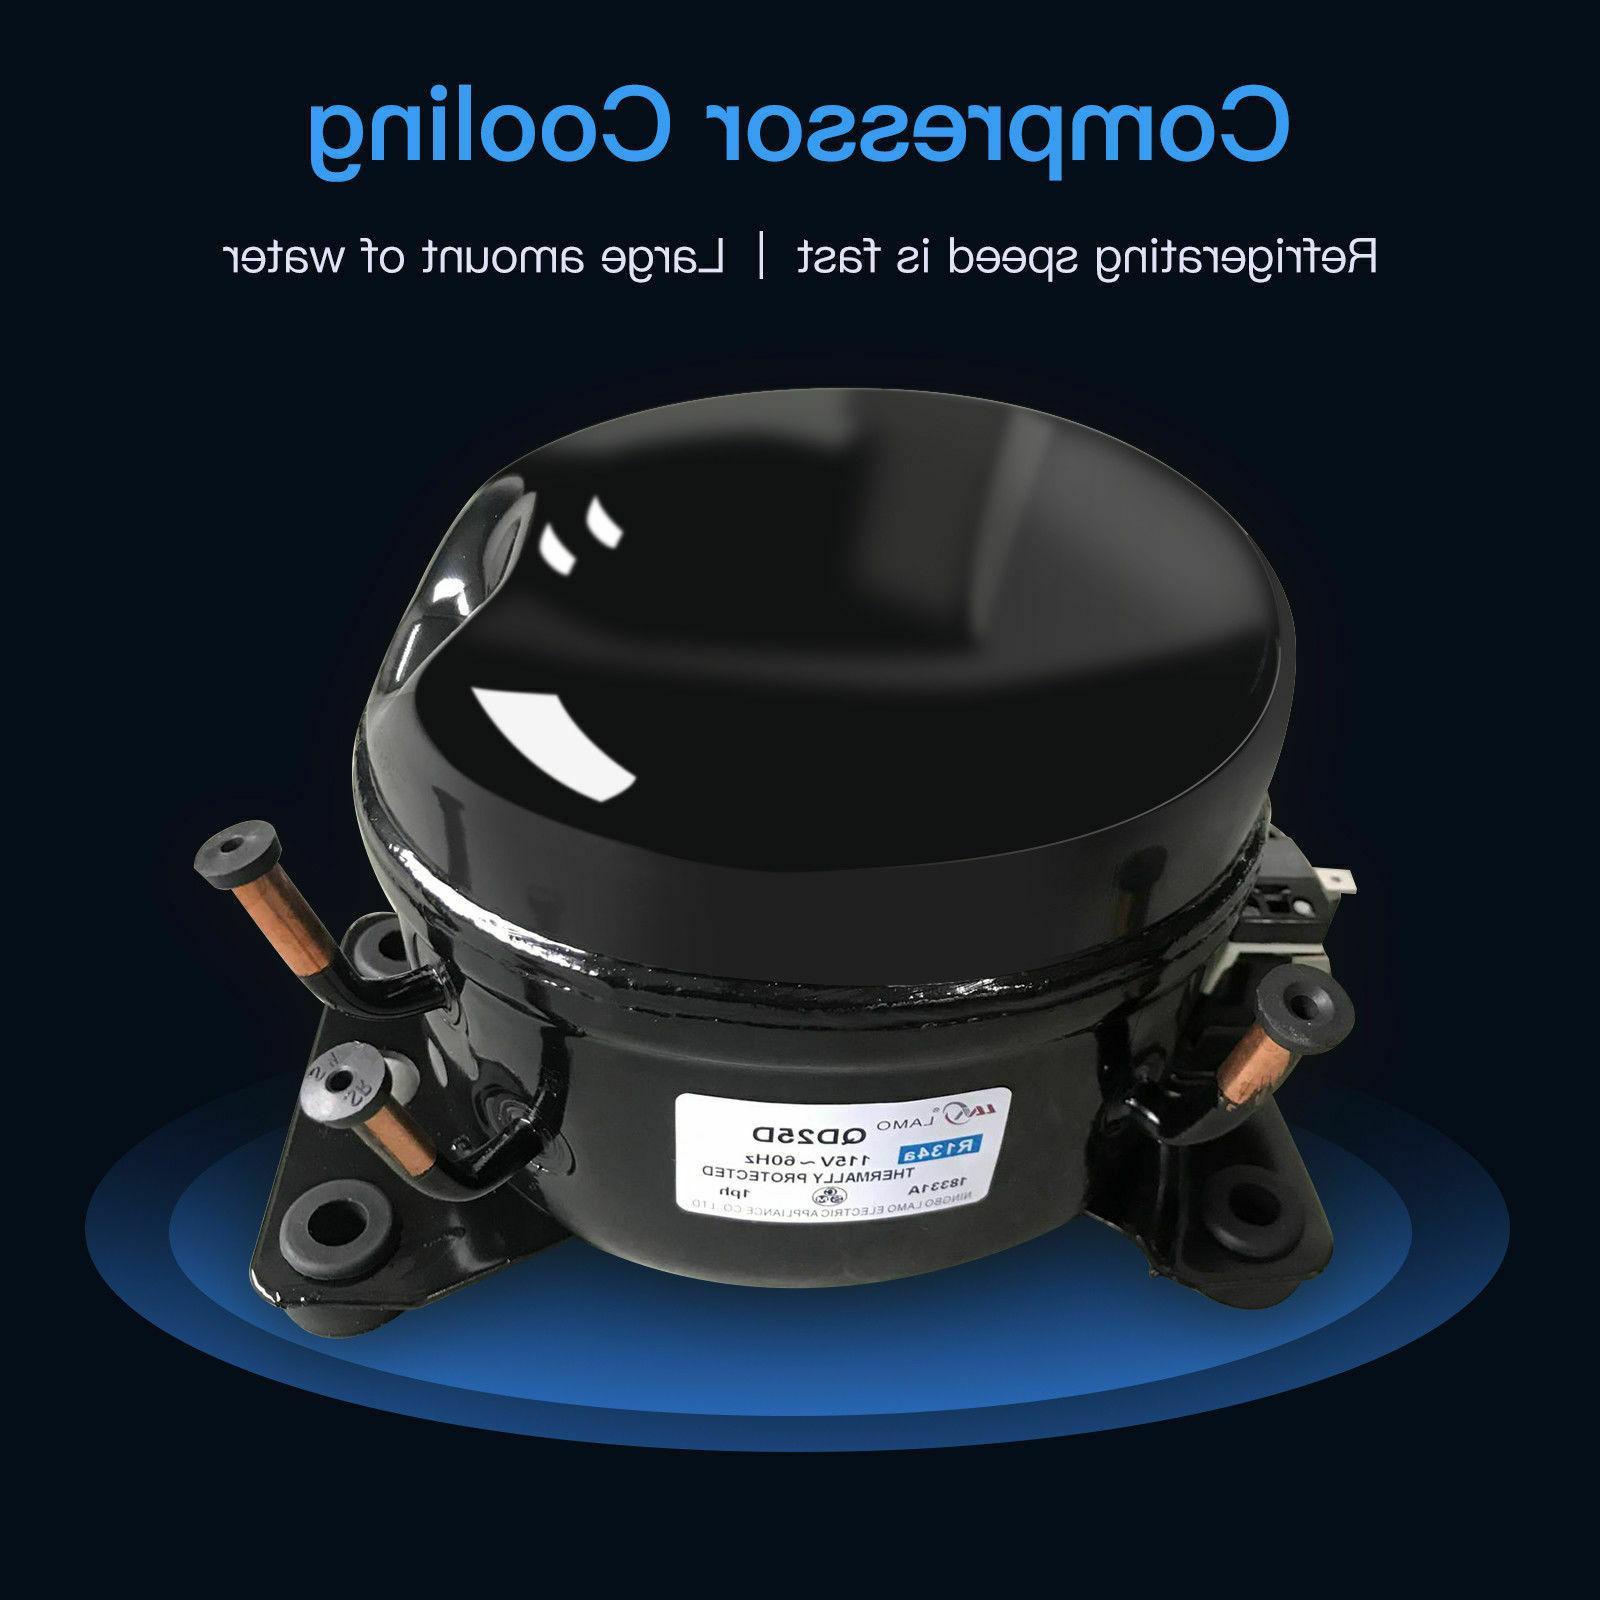 5 Gallon Water Dispenser Top Loading Storage Cabine Warm Water